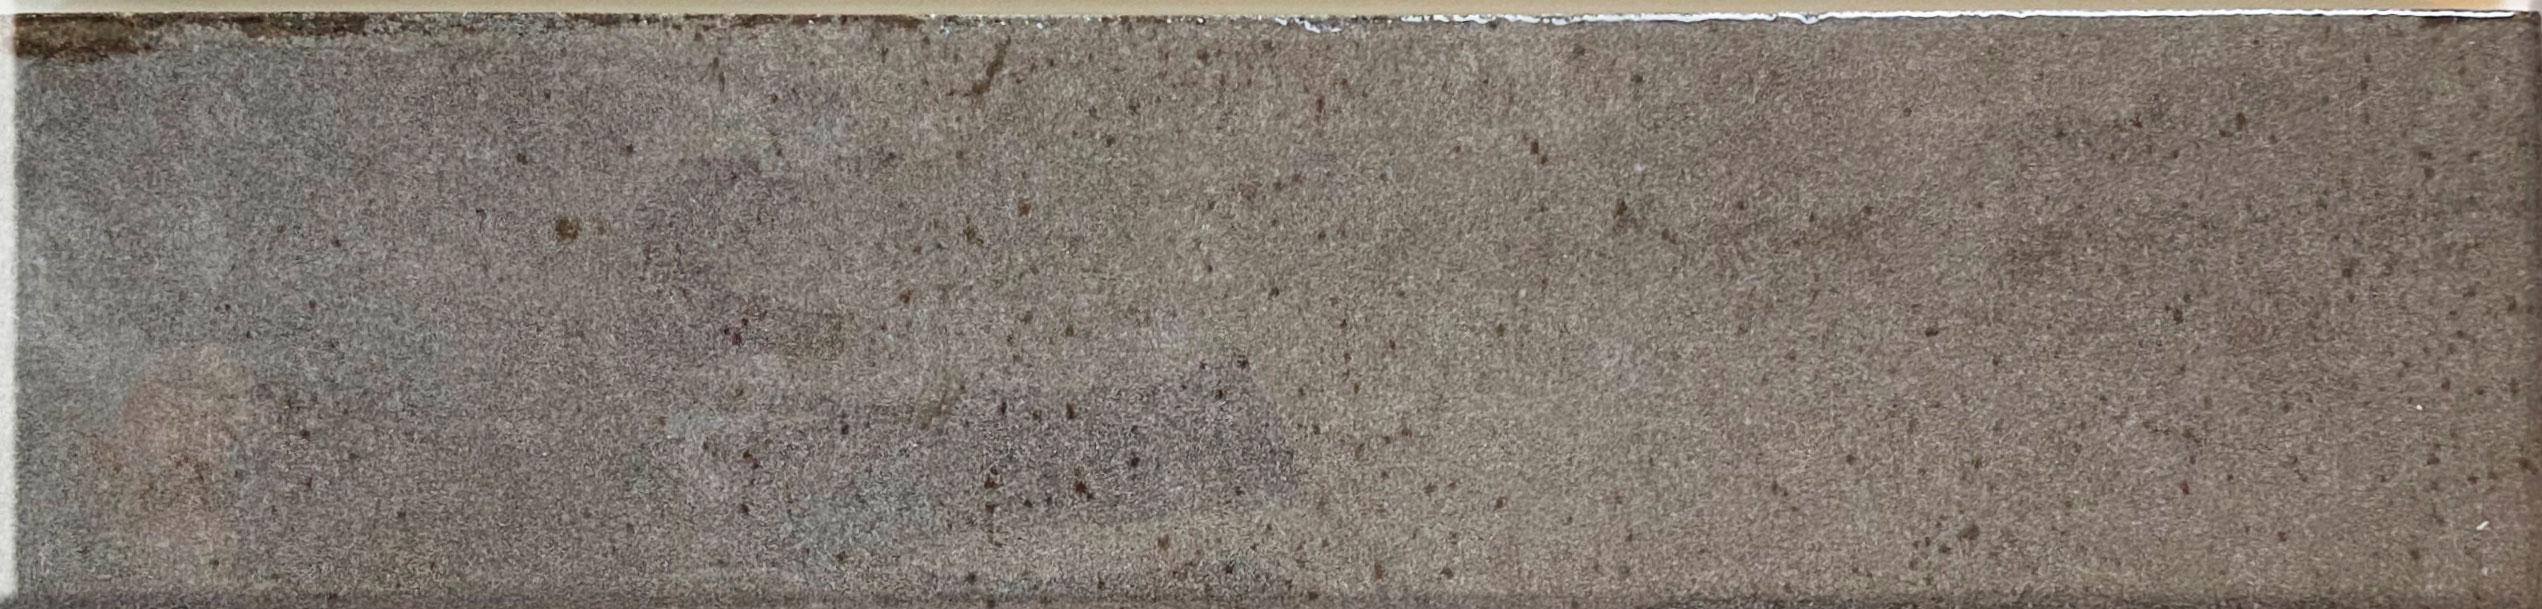 PURE BALANCE Bricks stone Image